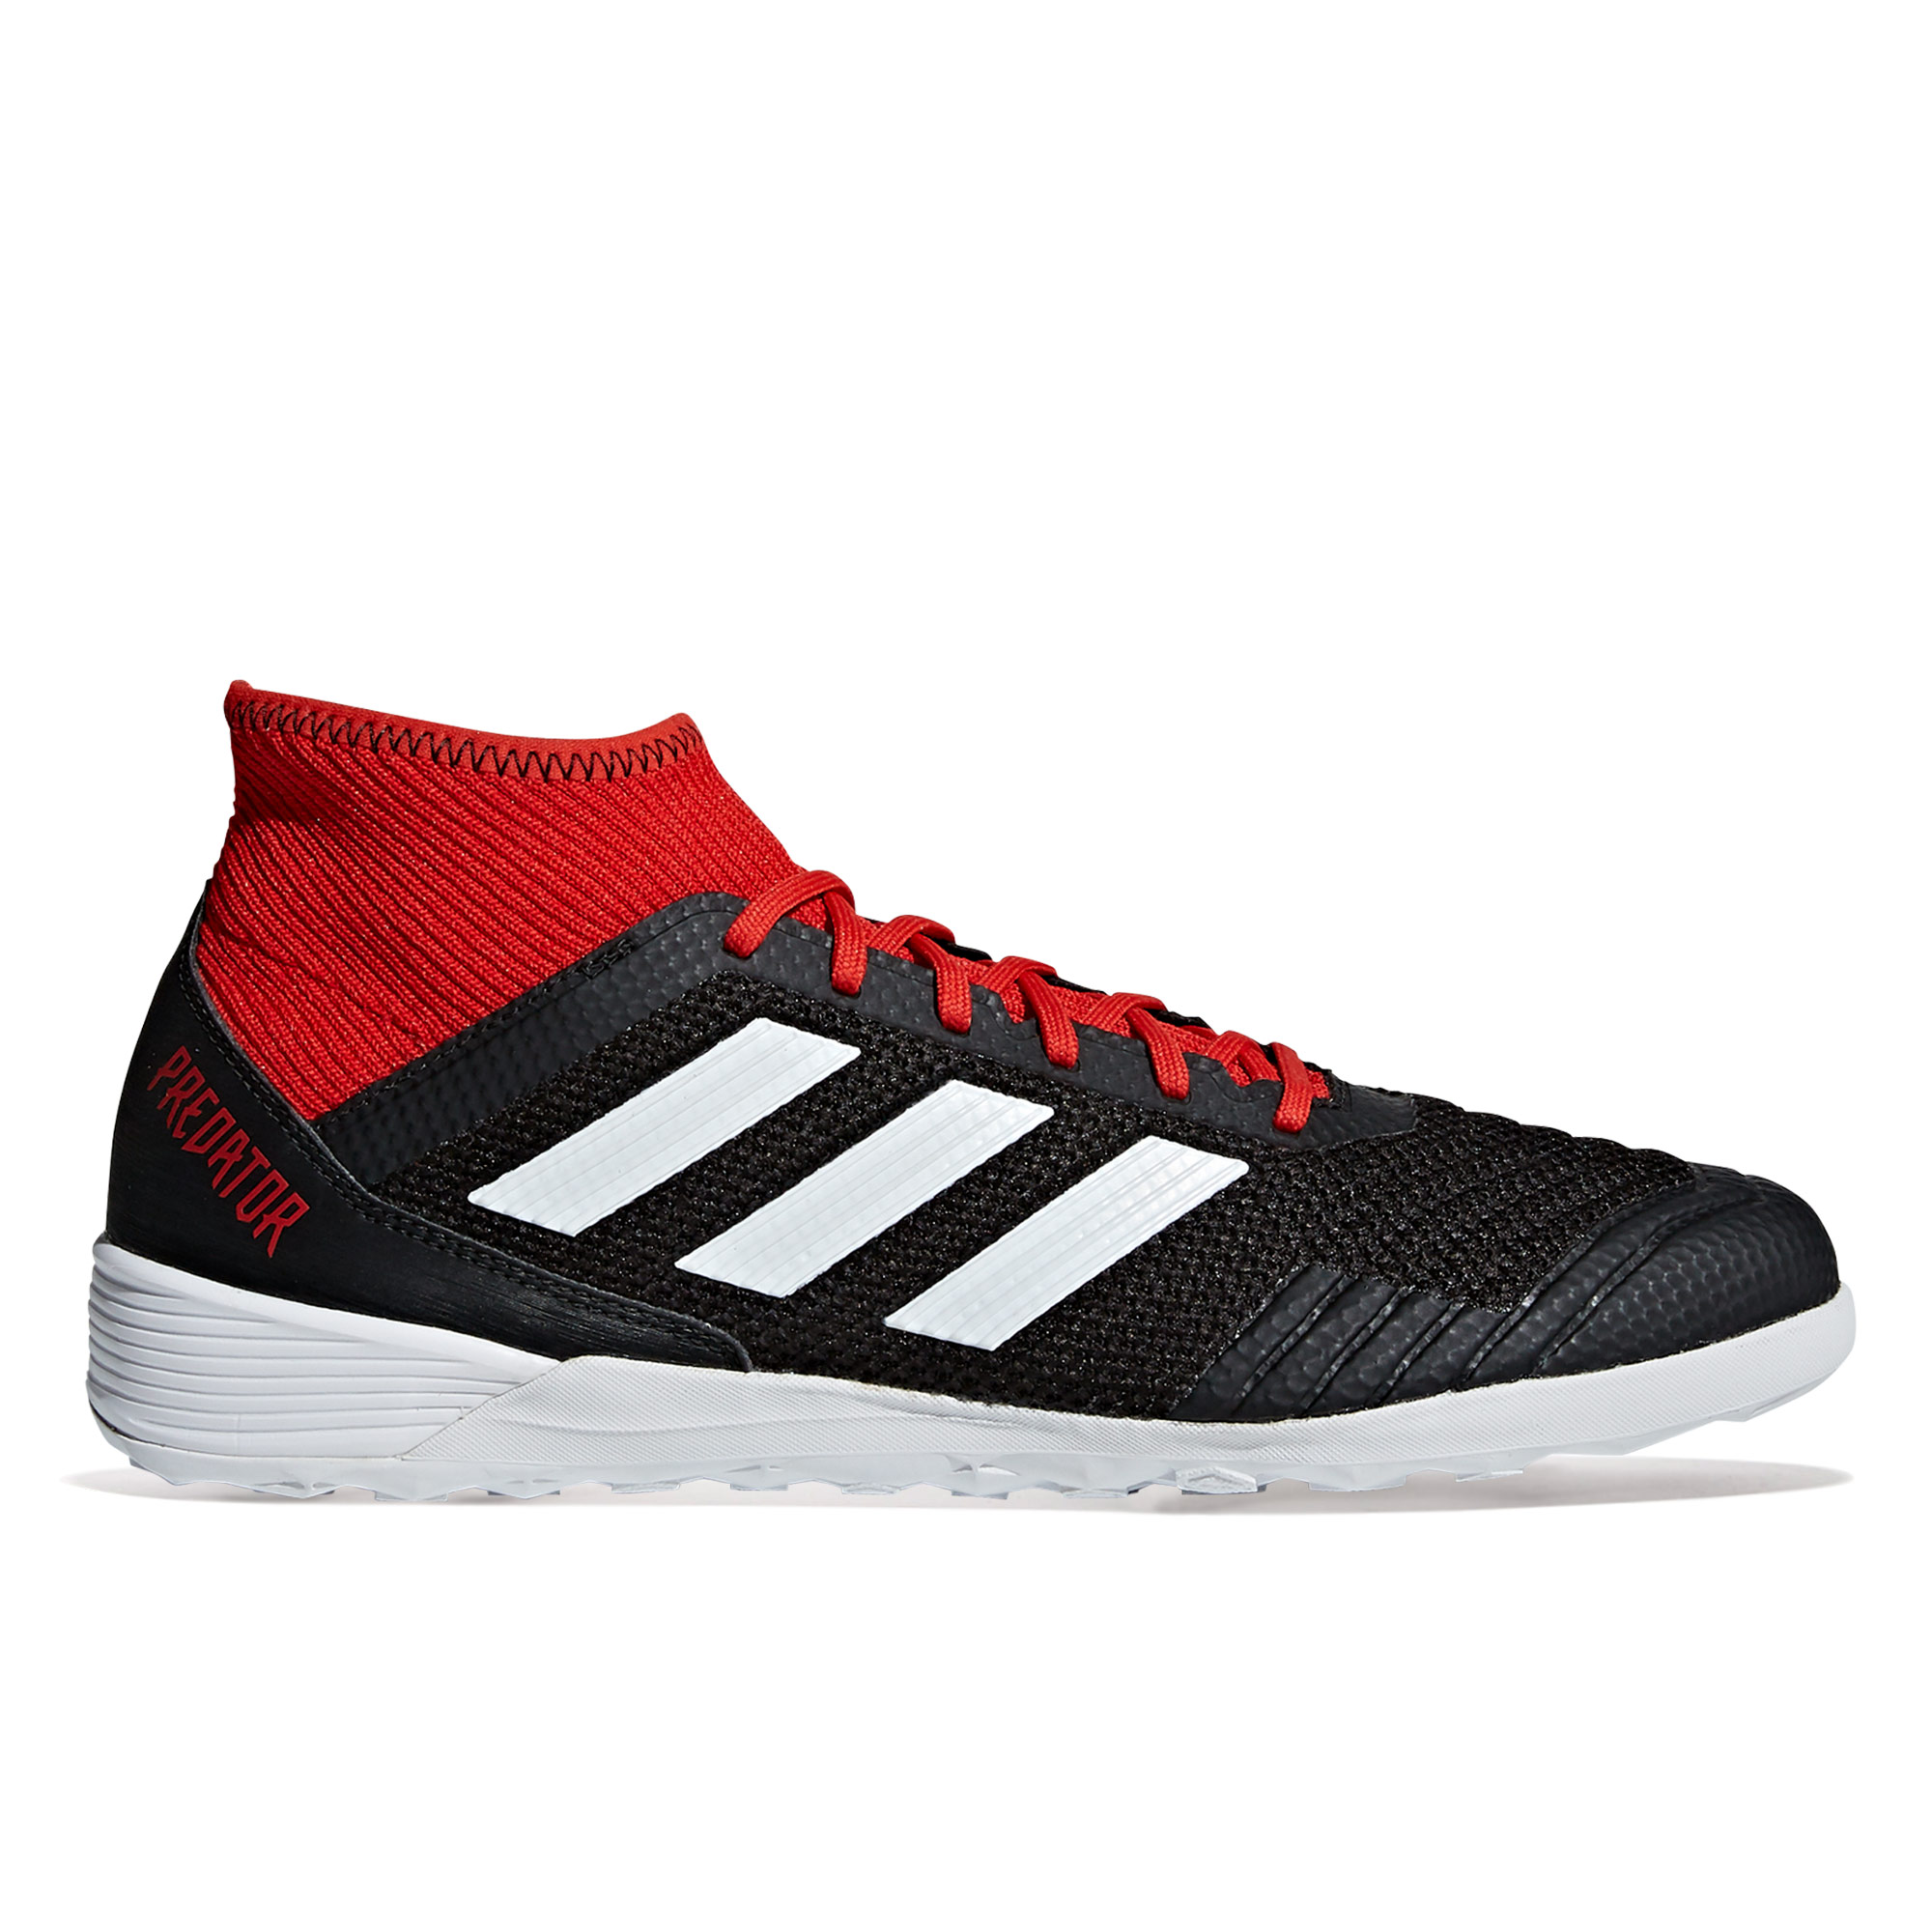 Adidas / Adidas Predator Tango 18.3 Indoor Trainers - Black